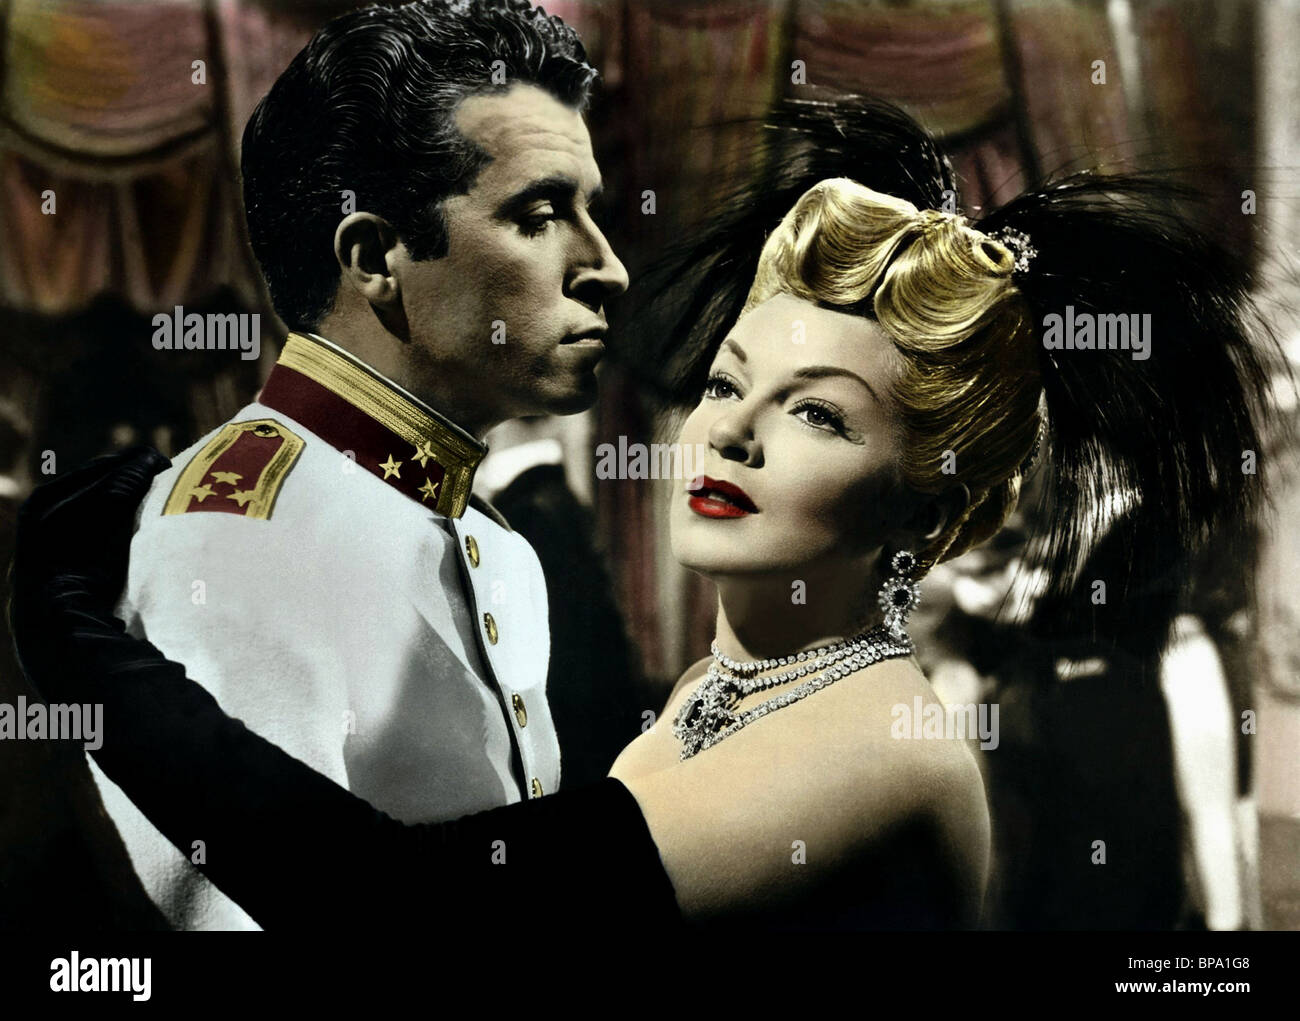 FERNANDO LAMAS LANA TURNER THE MERRY WIDOW 1952